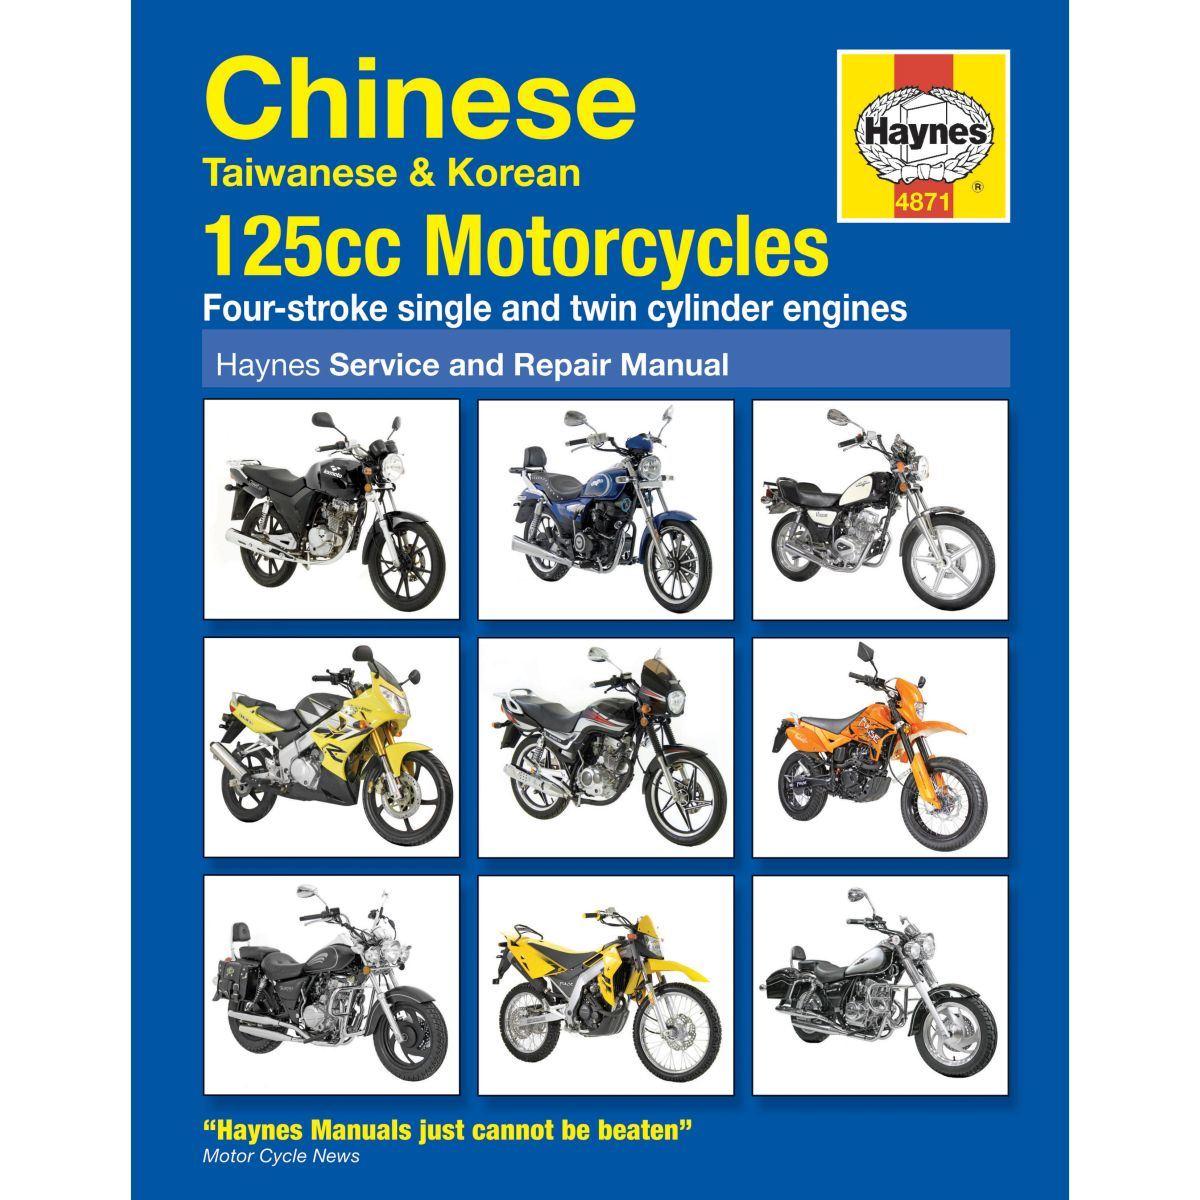 Lifan 125cc r race big bore engine motor dirt bike assassin dhz.